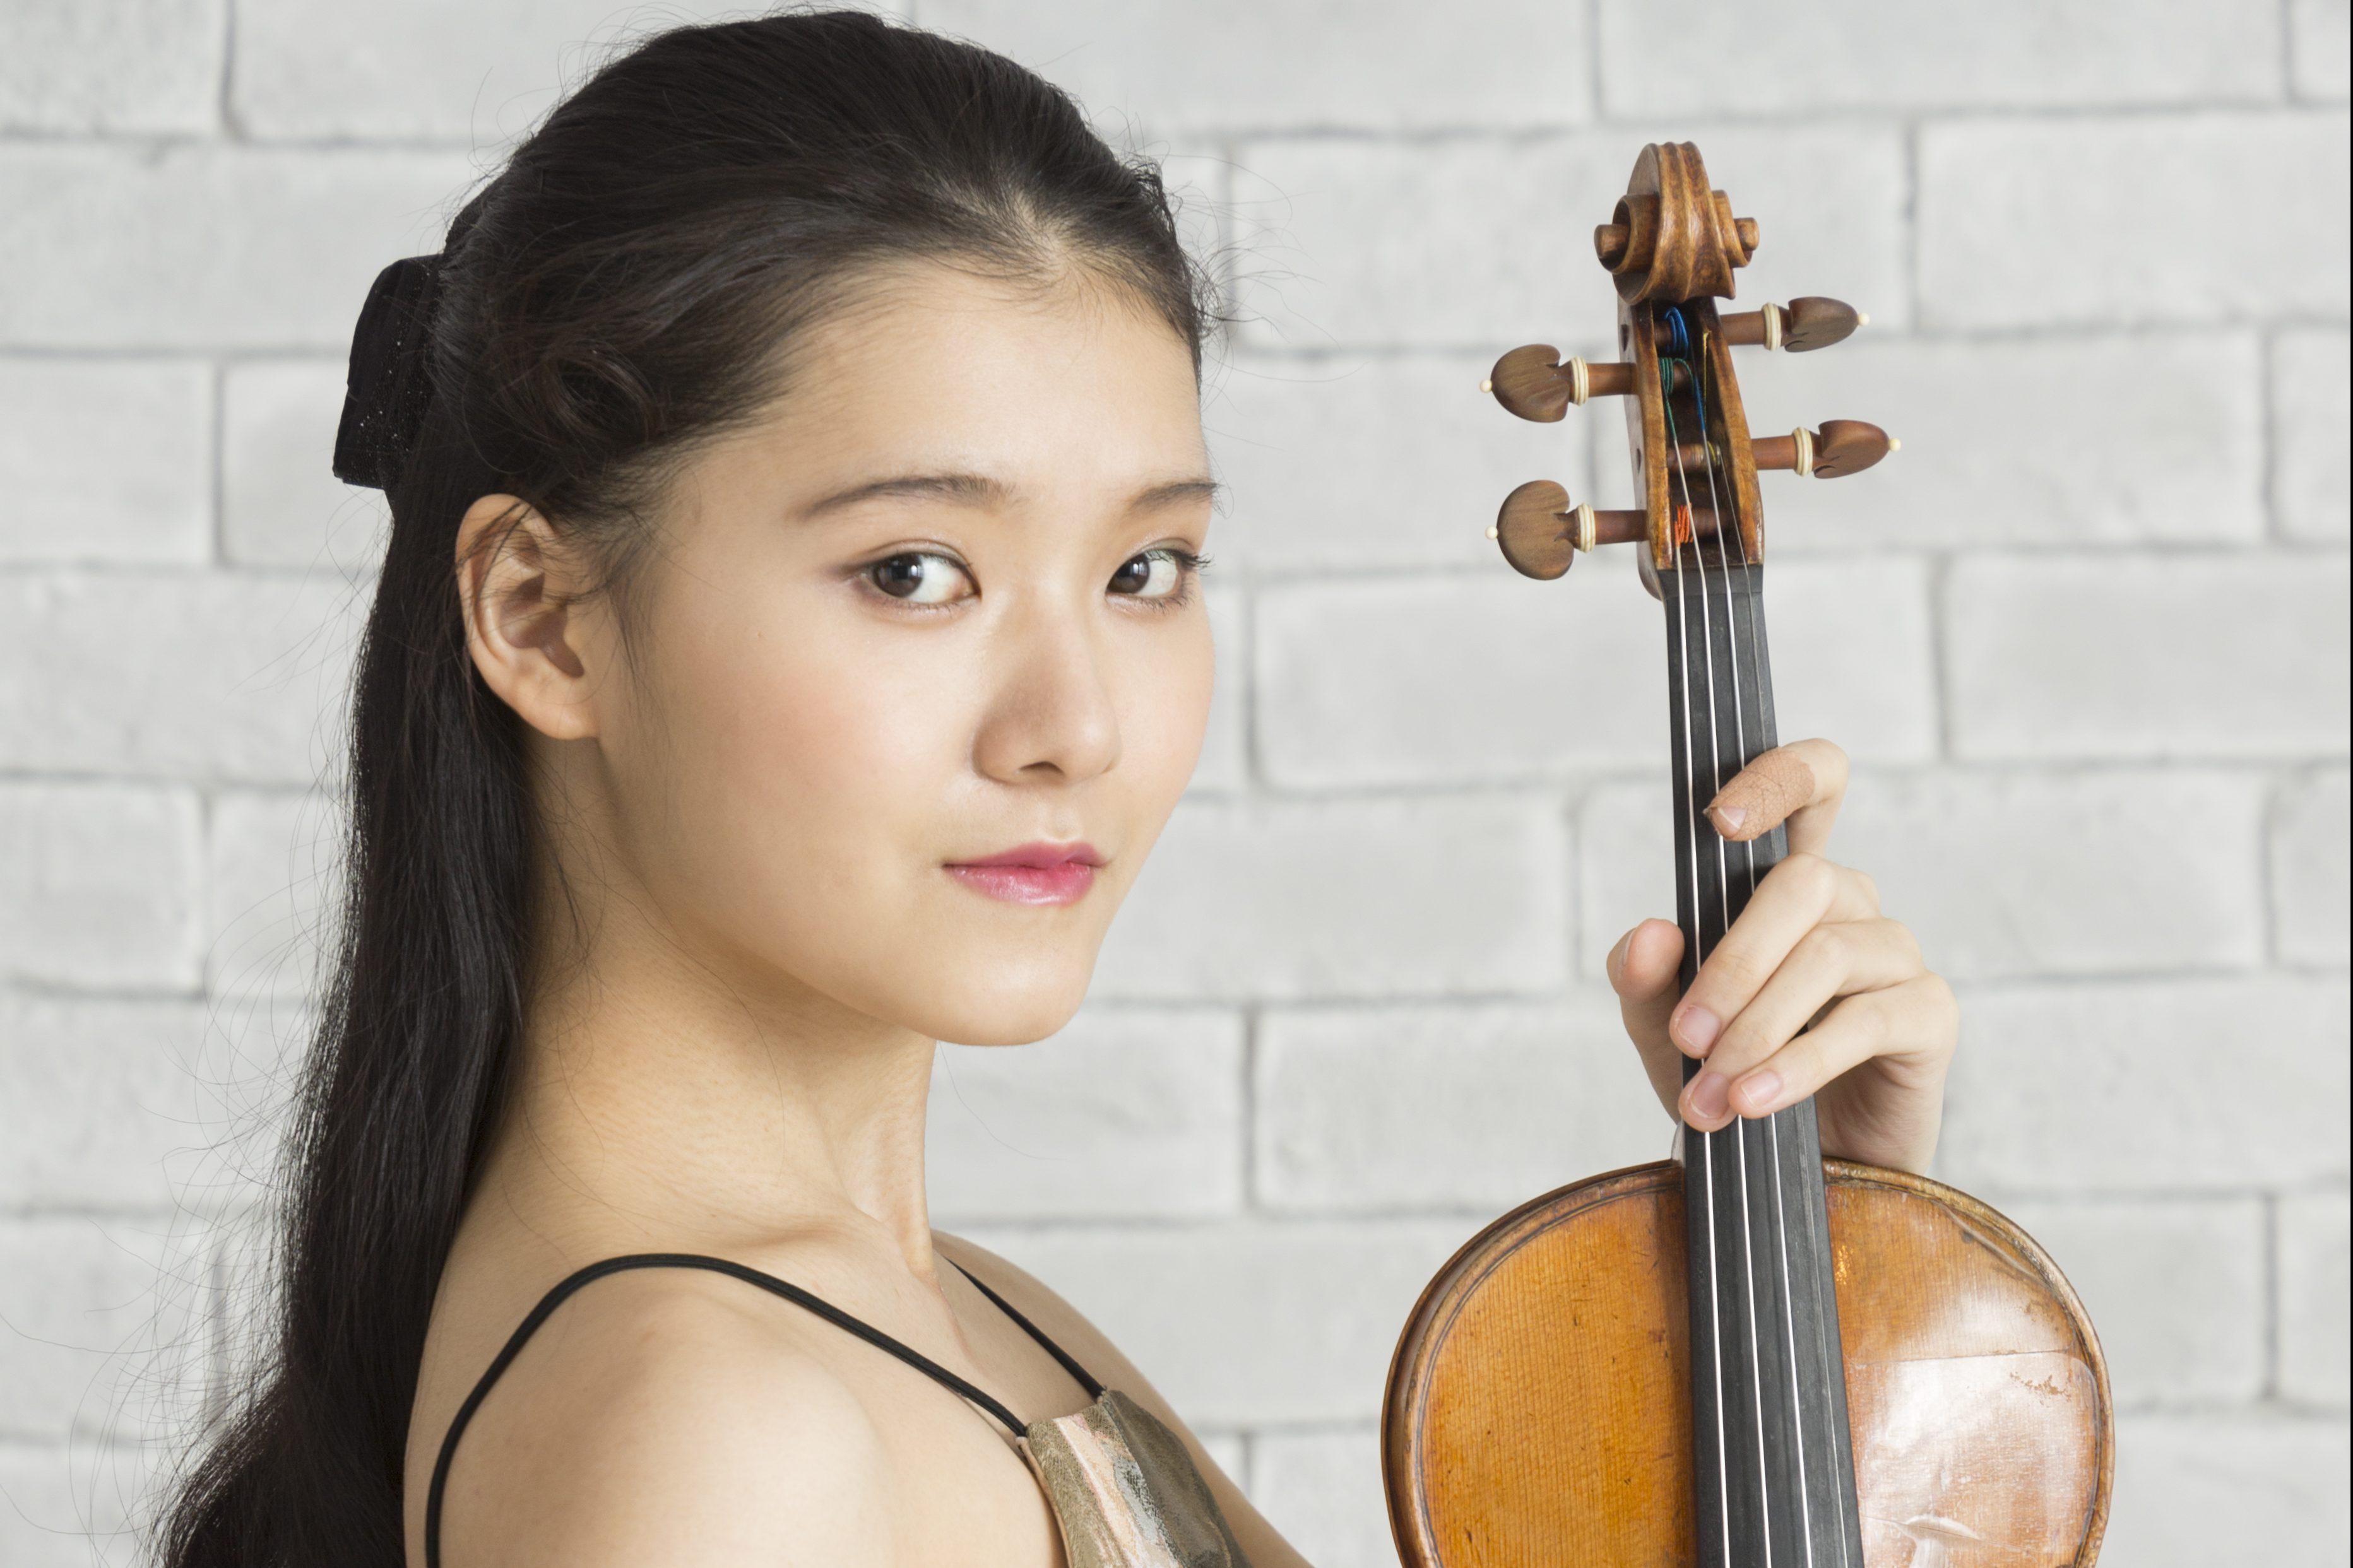 Moné Hattori performs at Mie Bunka Kaikan